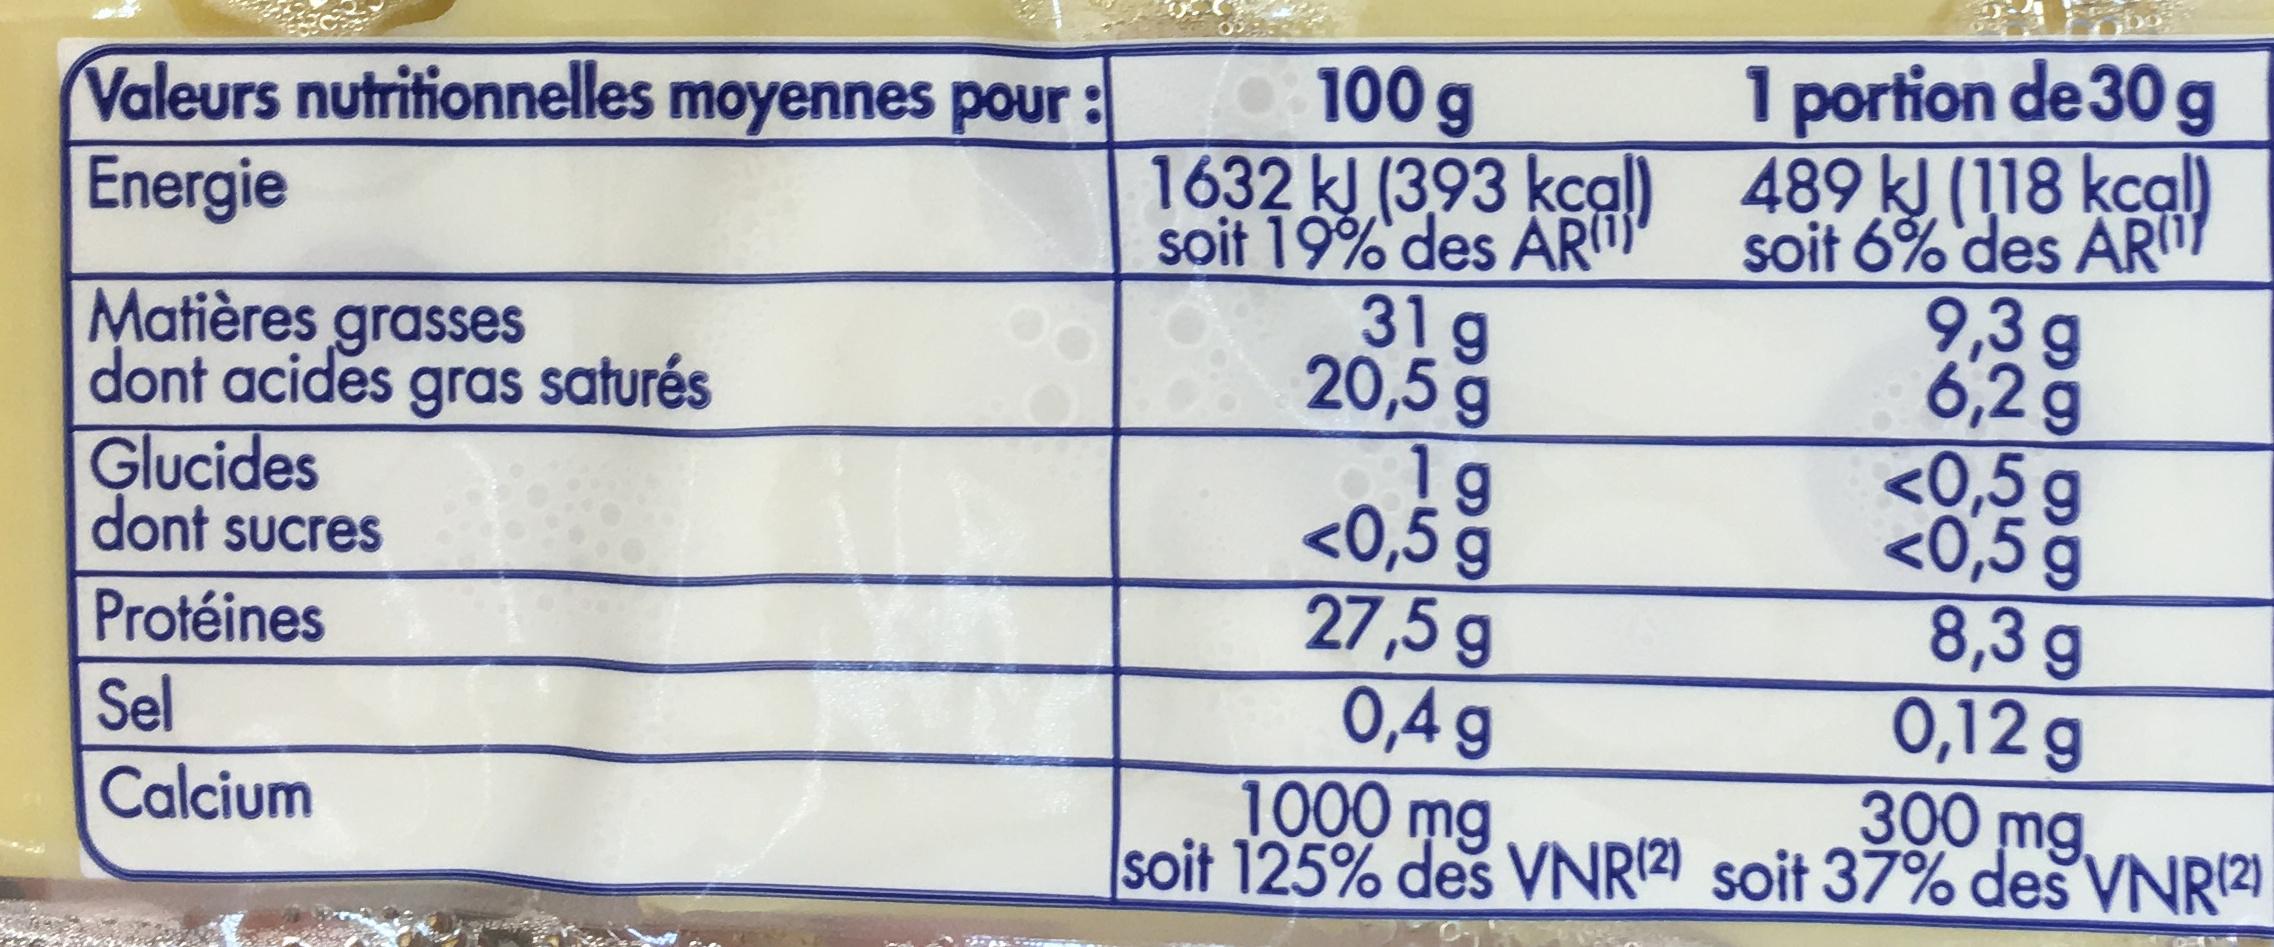 Emmental au lait cru - Informations nutritionnelles - fr